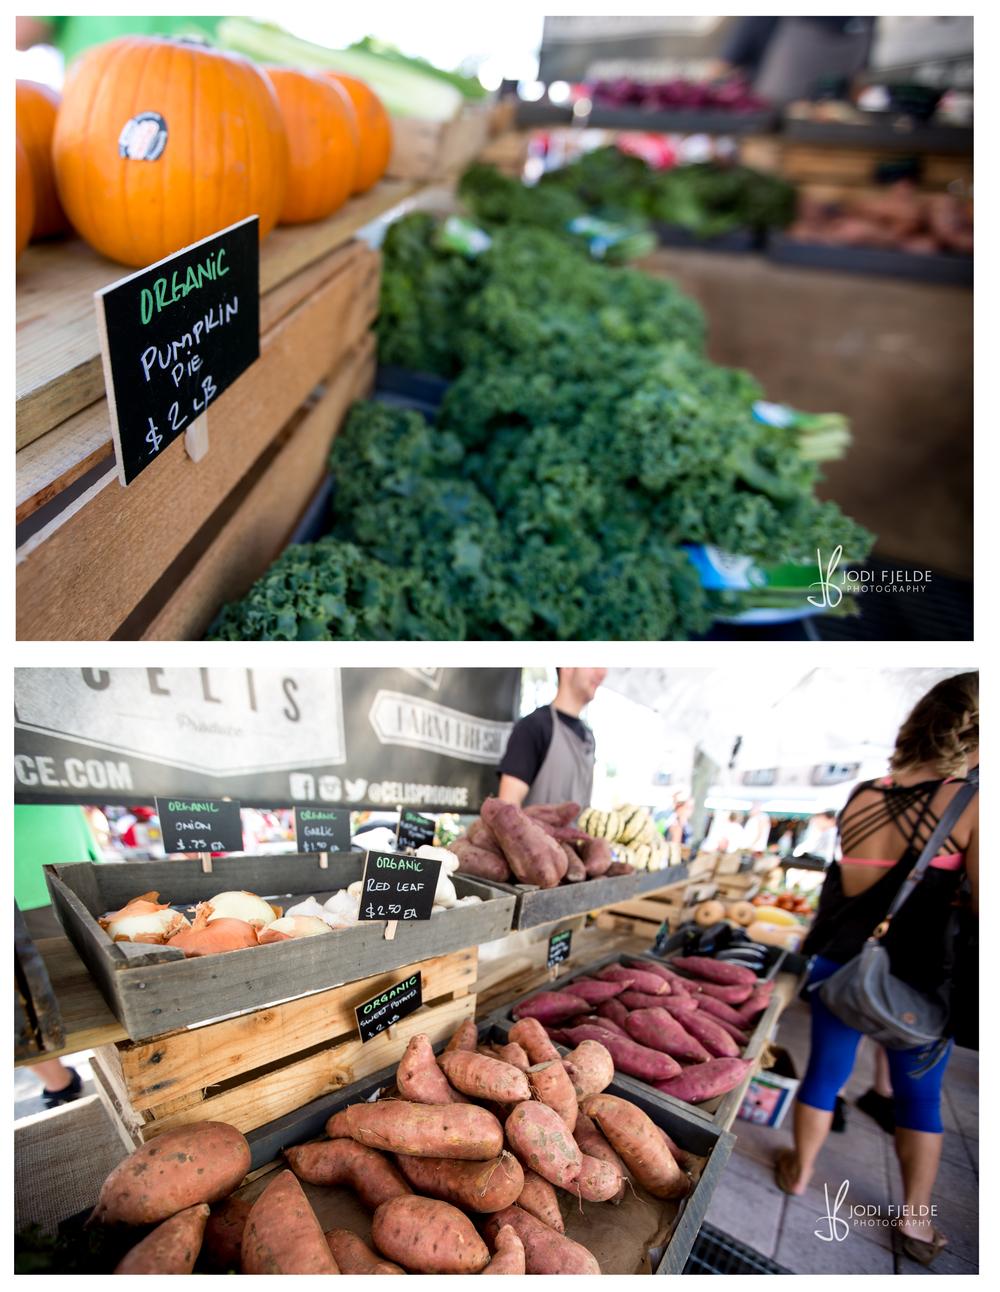 West_Palm_Beach_Green_Market_Organic_jodi_fjelde_Photography_2.jpg